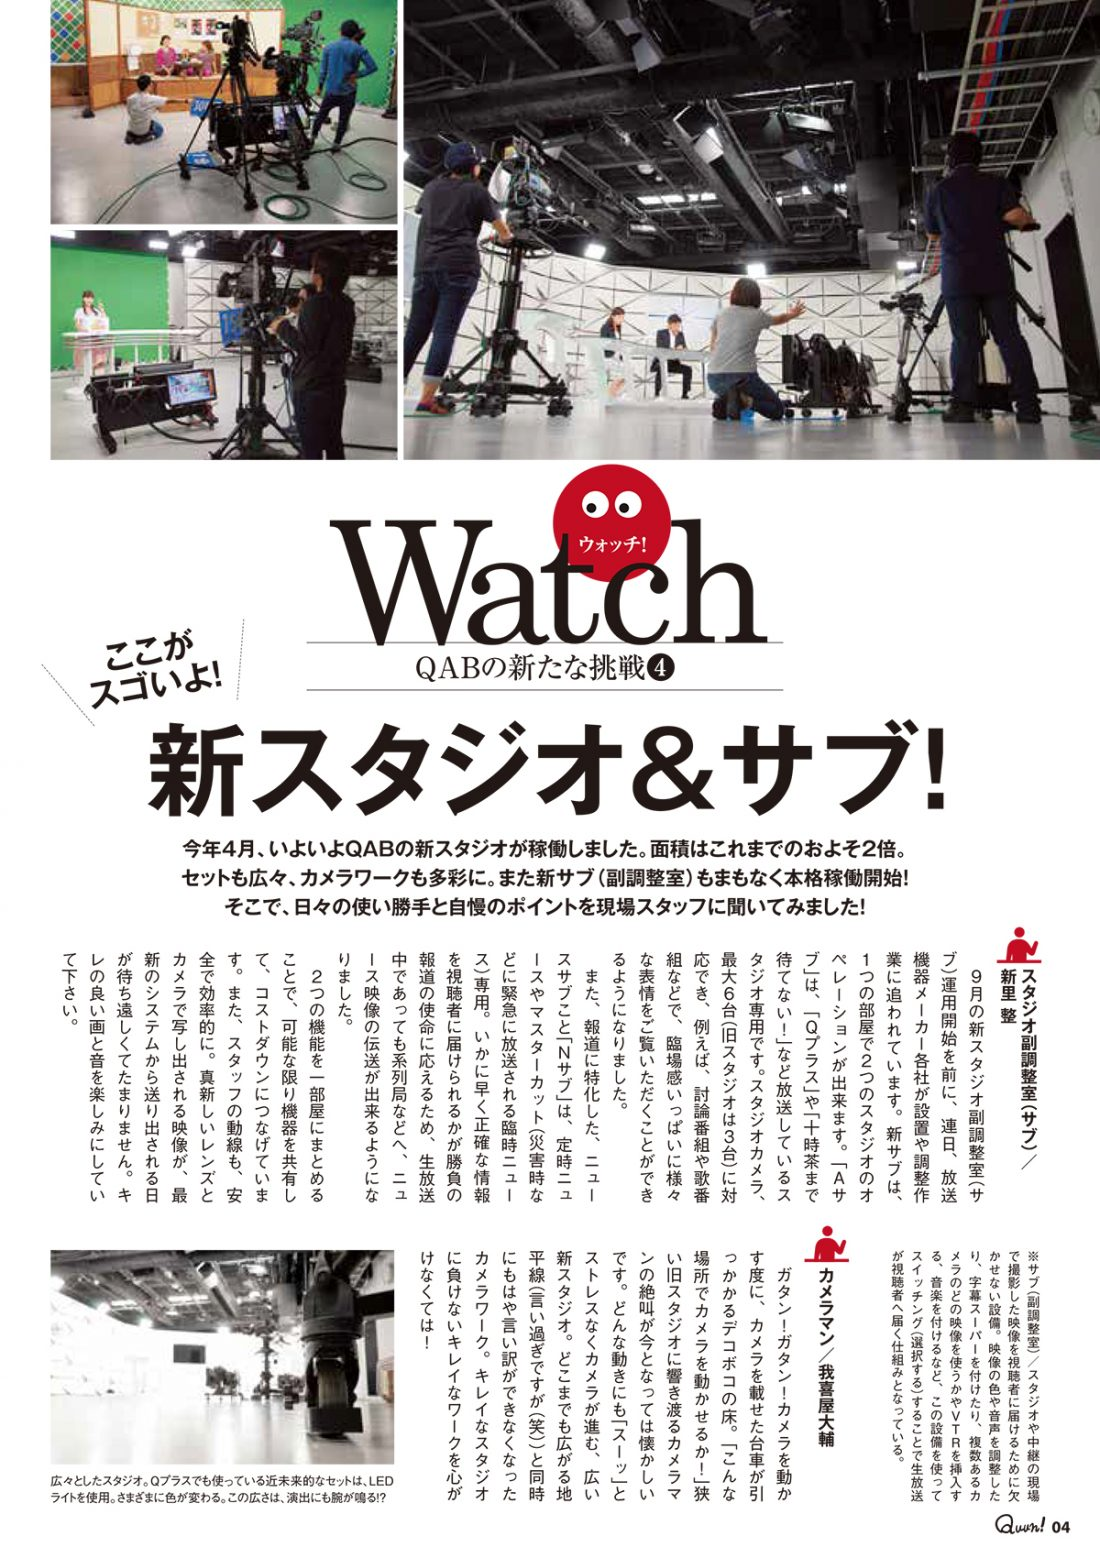 http://www.qab.co.jp/qgoro/wp-content/uploads/quun_0806-1100x1558.jpg